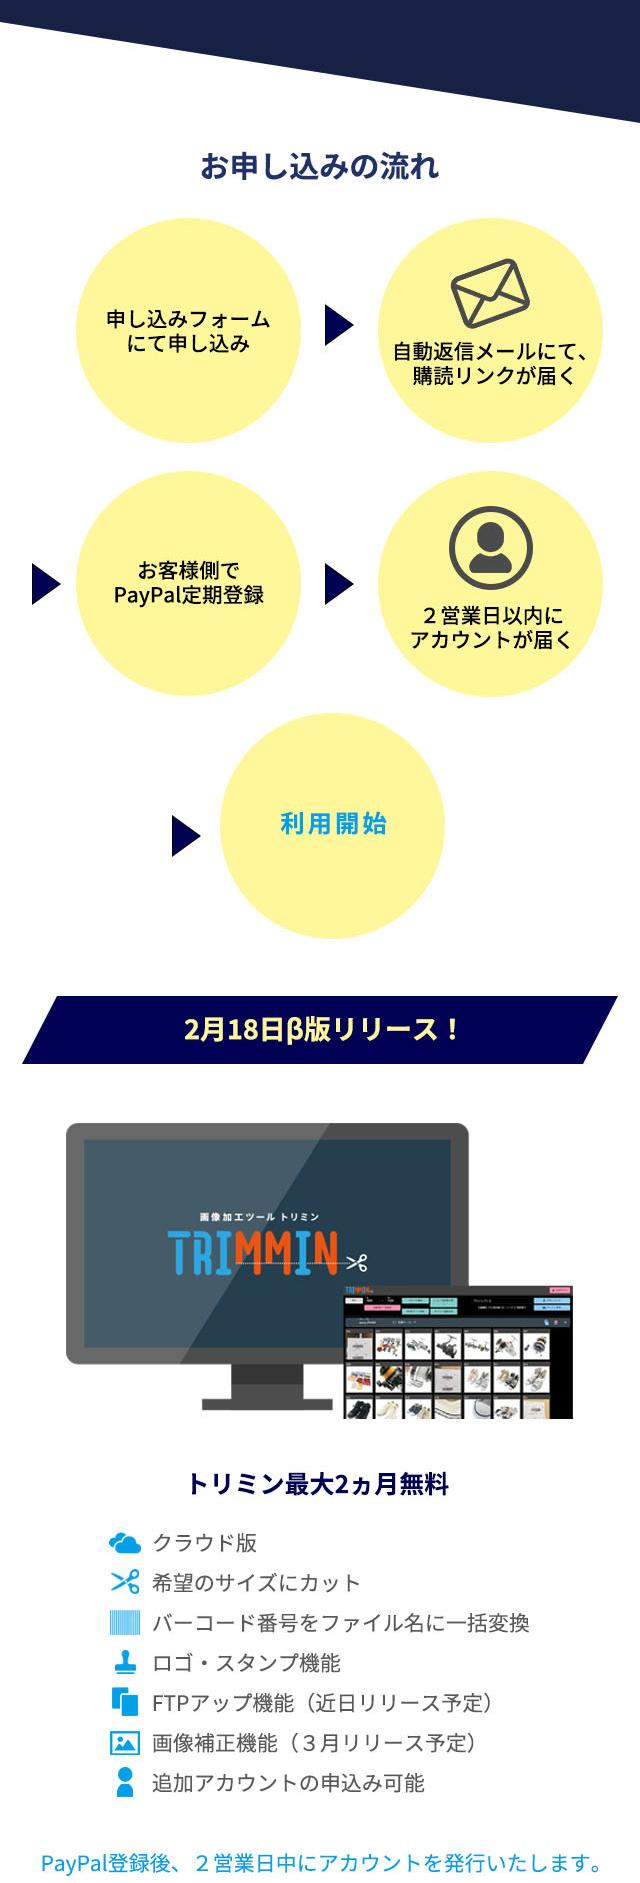 TRIMMIN-SP_13.jpg